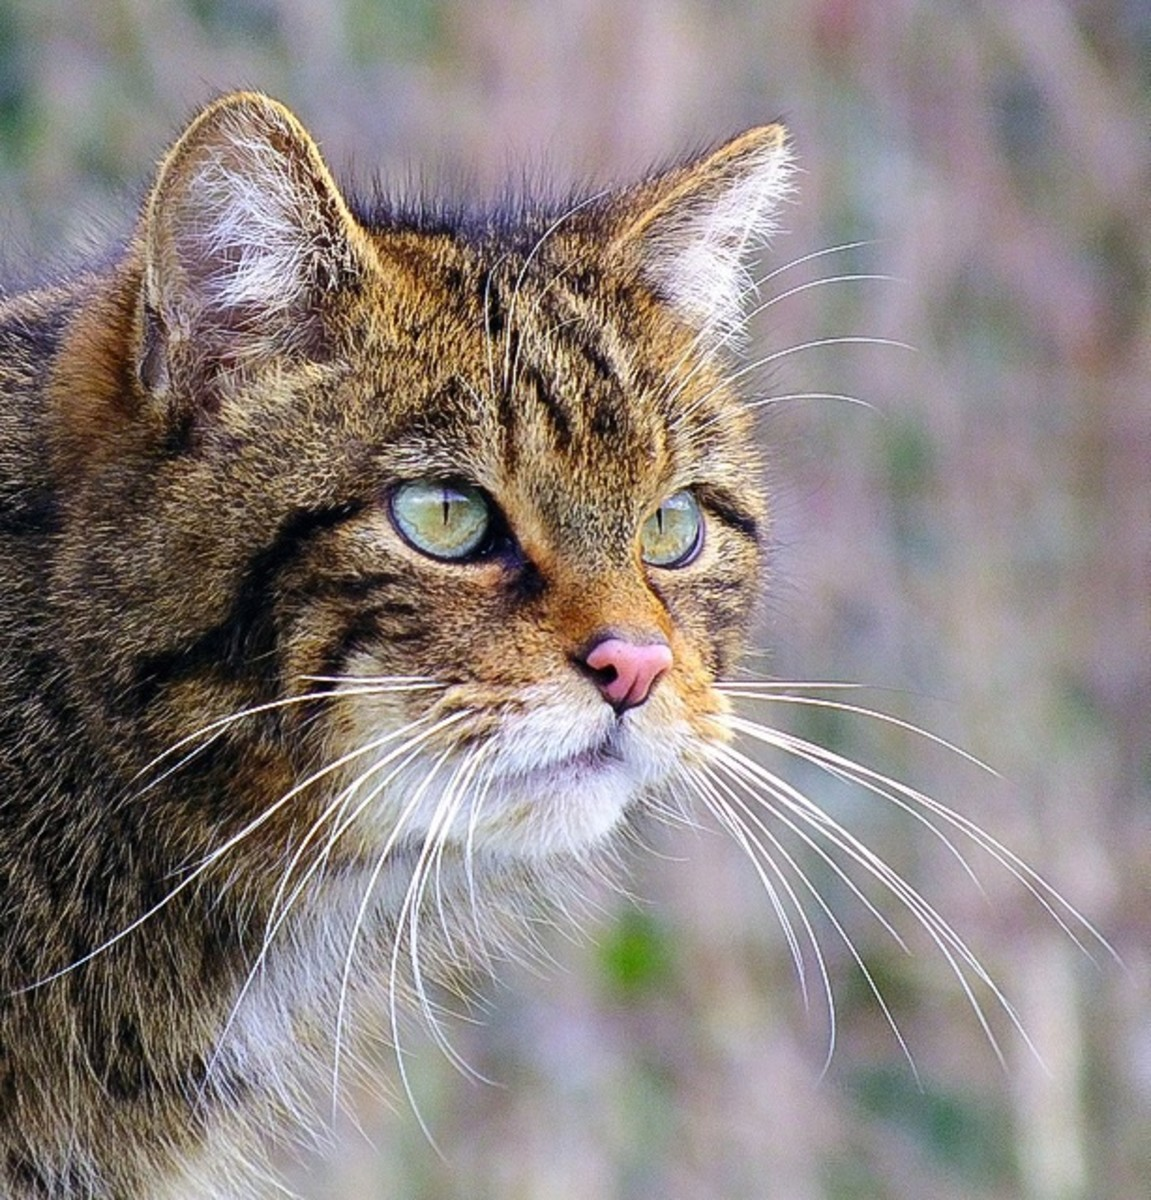 A beautiful Scottish wildcat